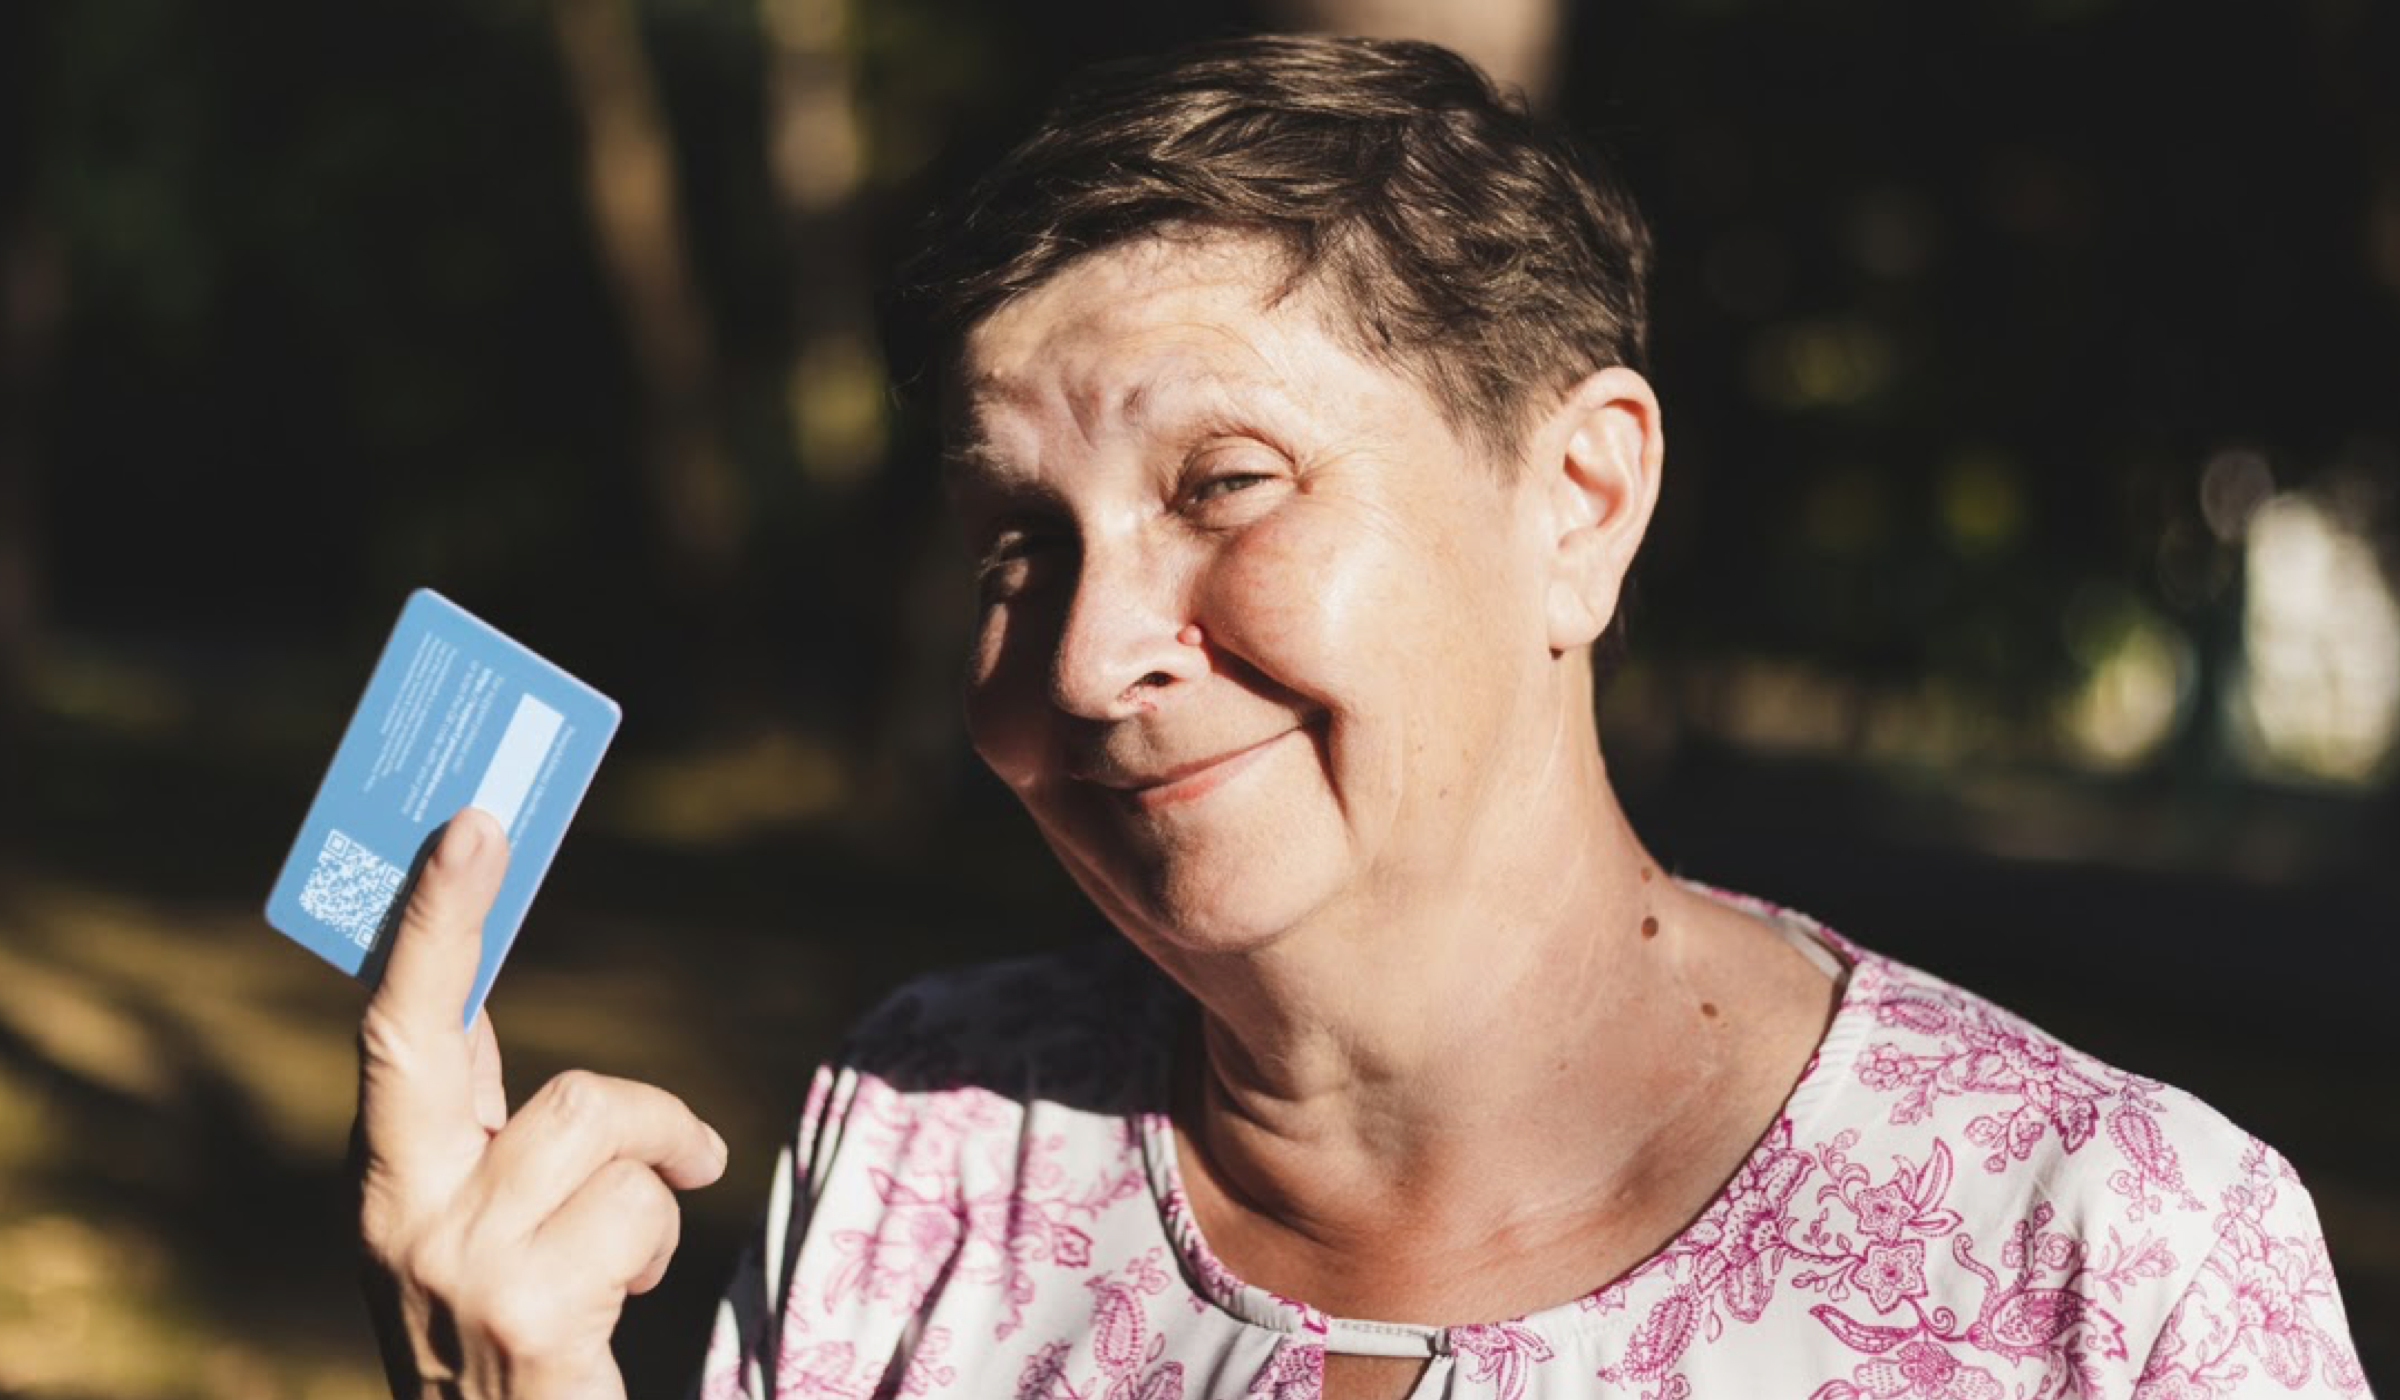 Smiling woman holds up blue ProxyAddress card